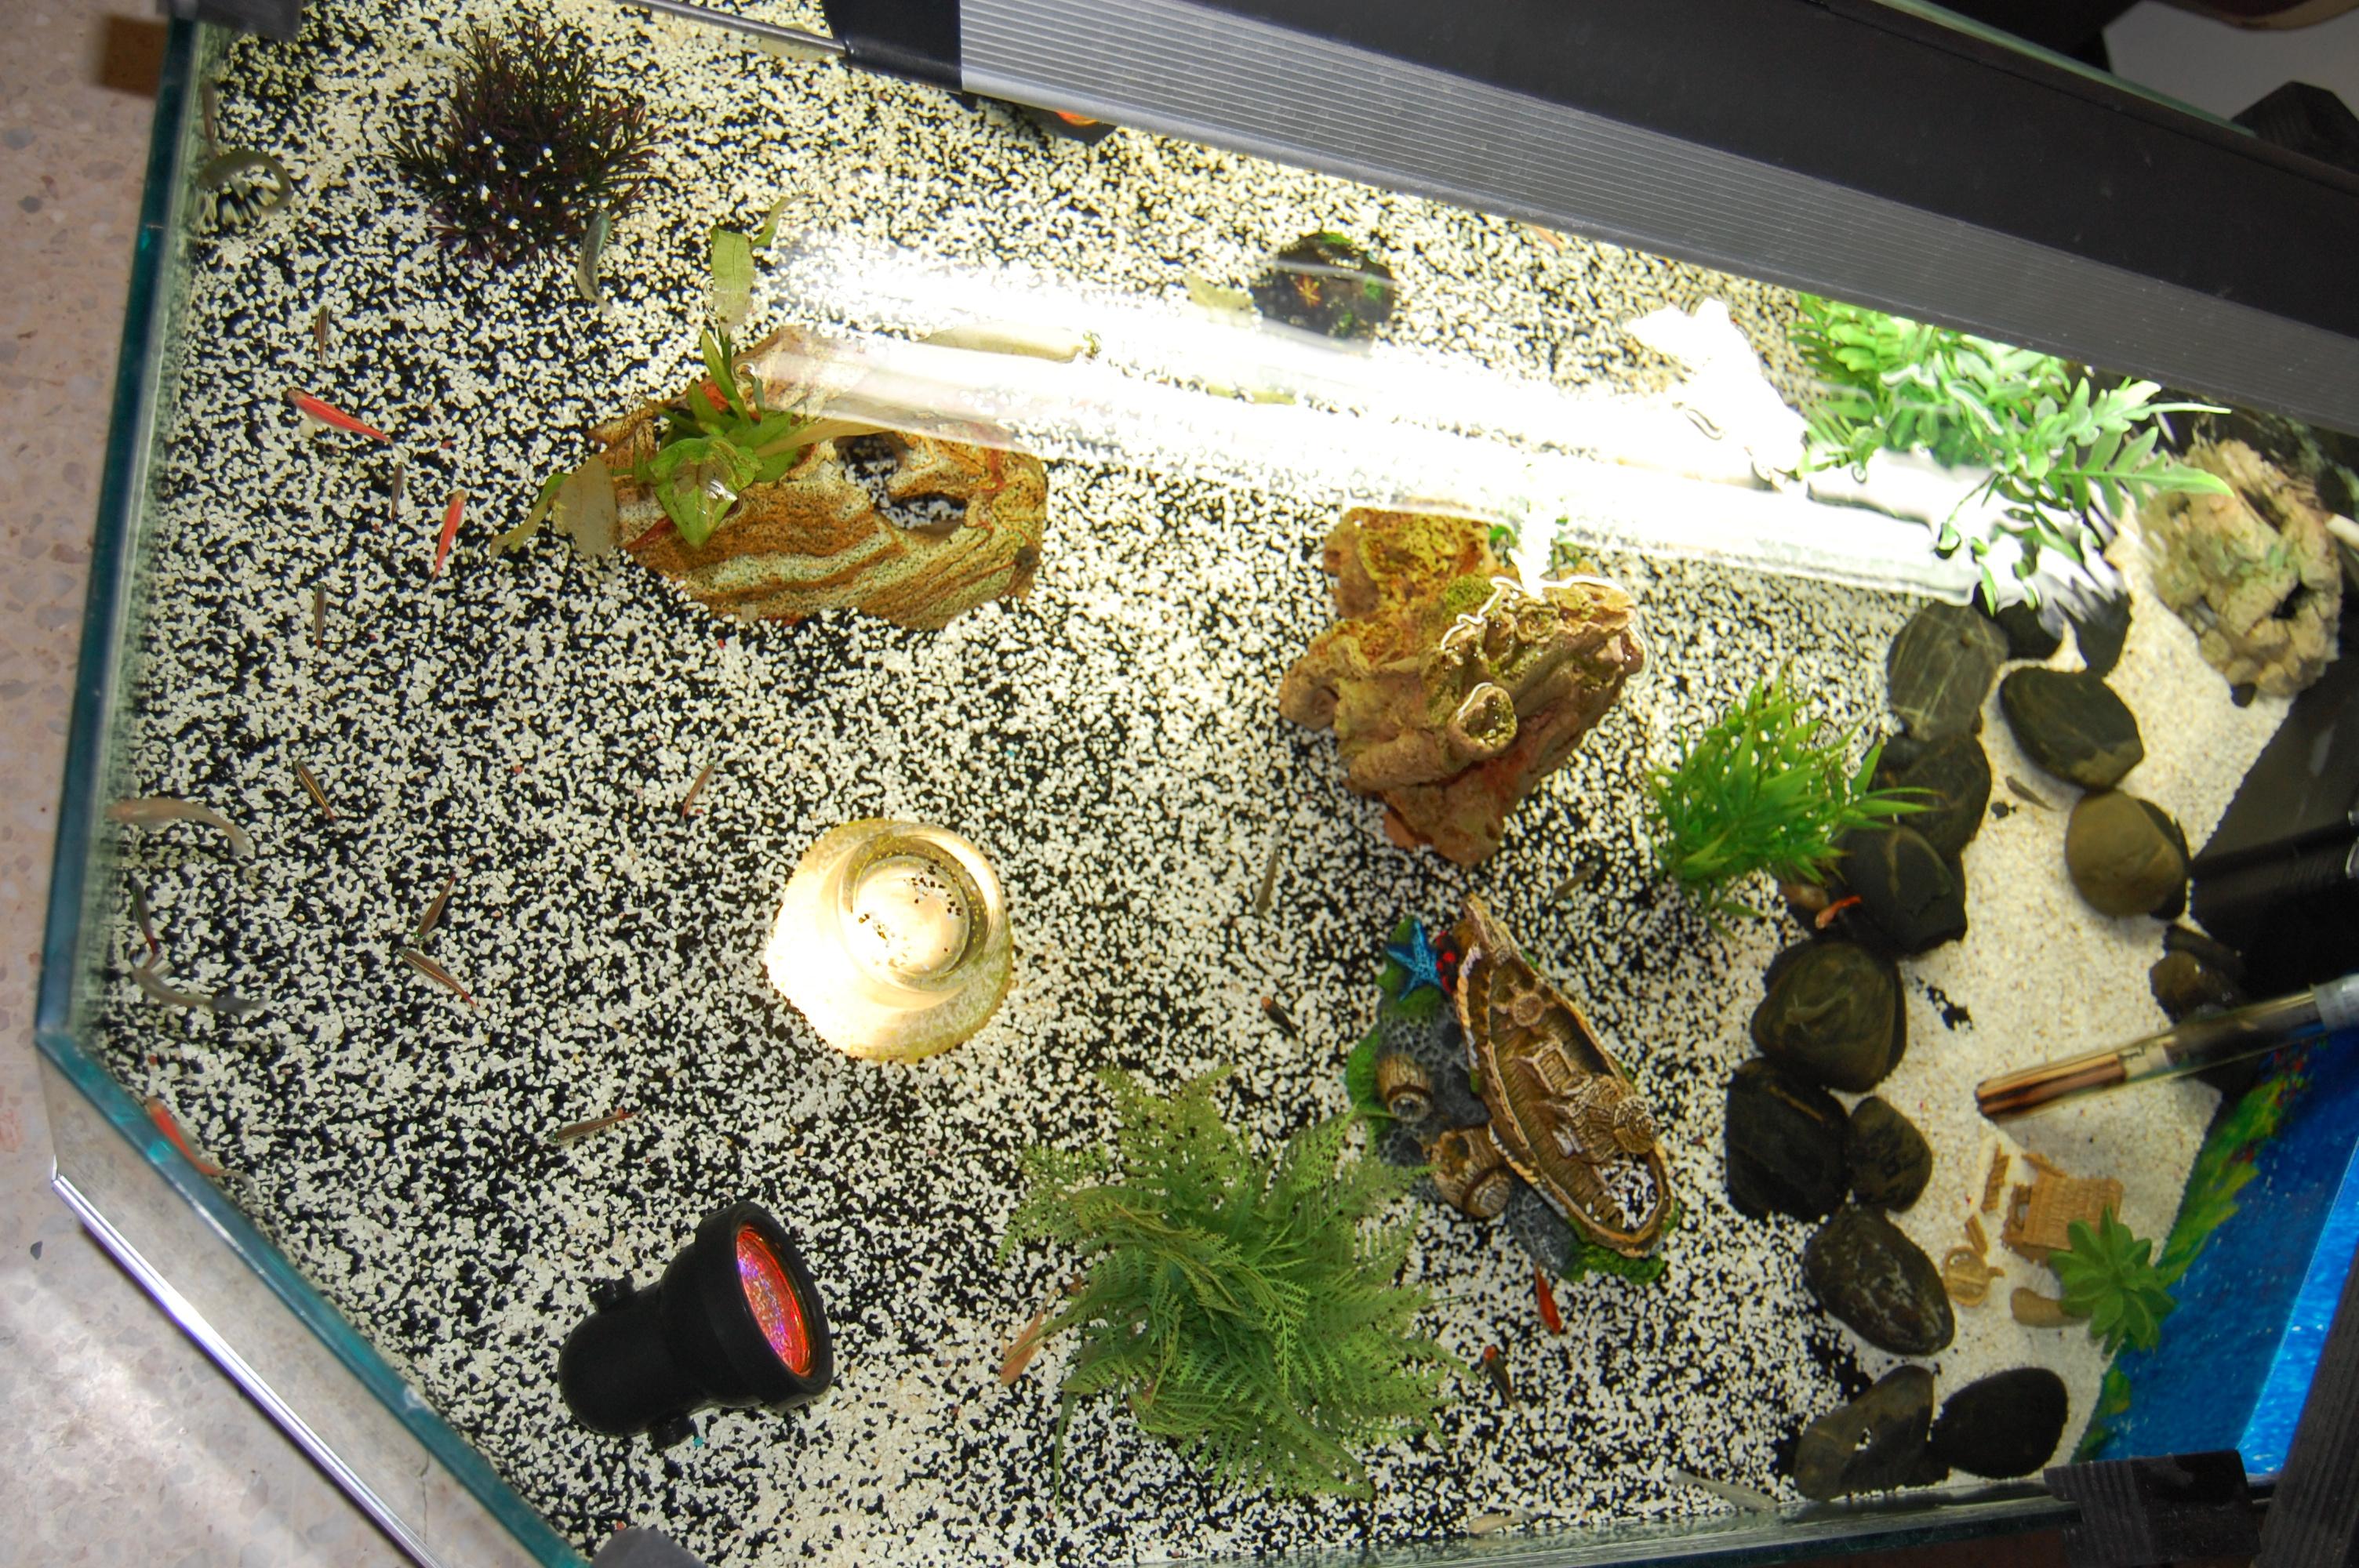 dsc 0015 table basse aquarium fait maison lol lynka83. Black Bedroom Furniture Sets. Home Design Ideas